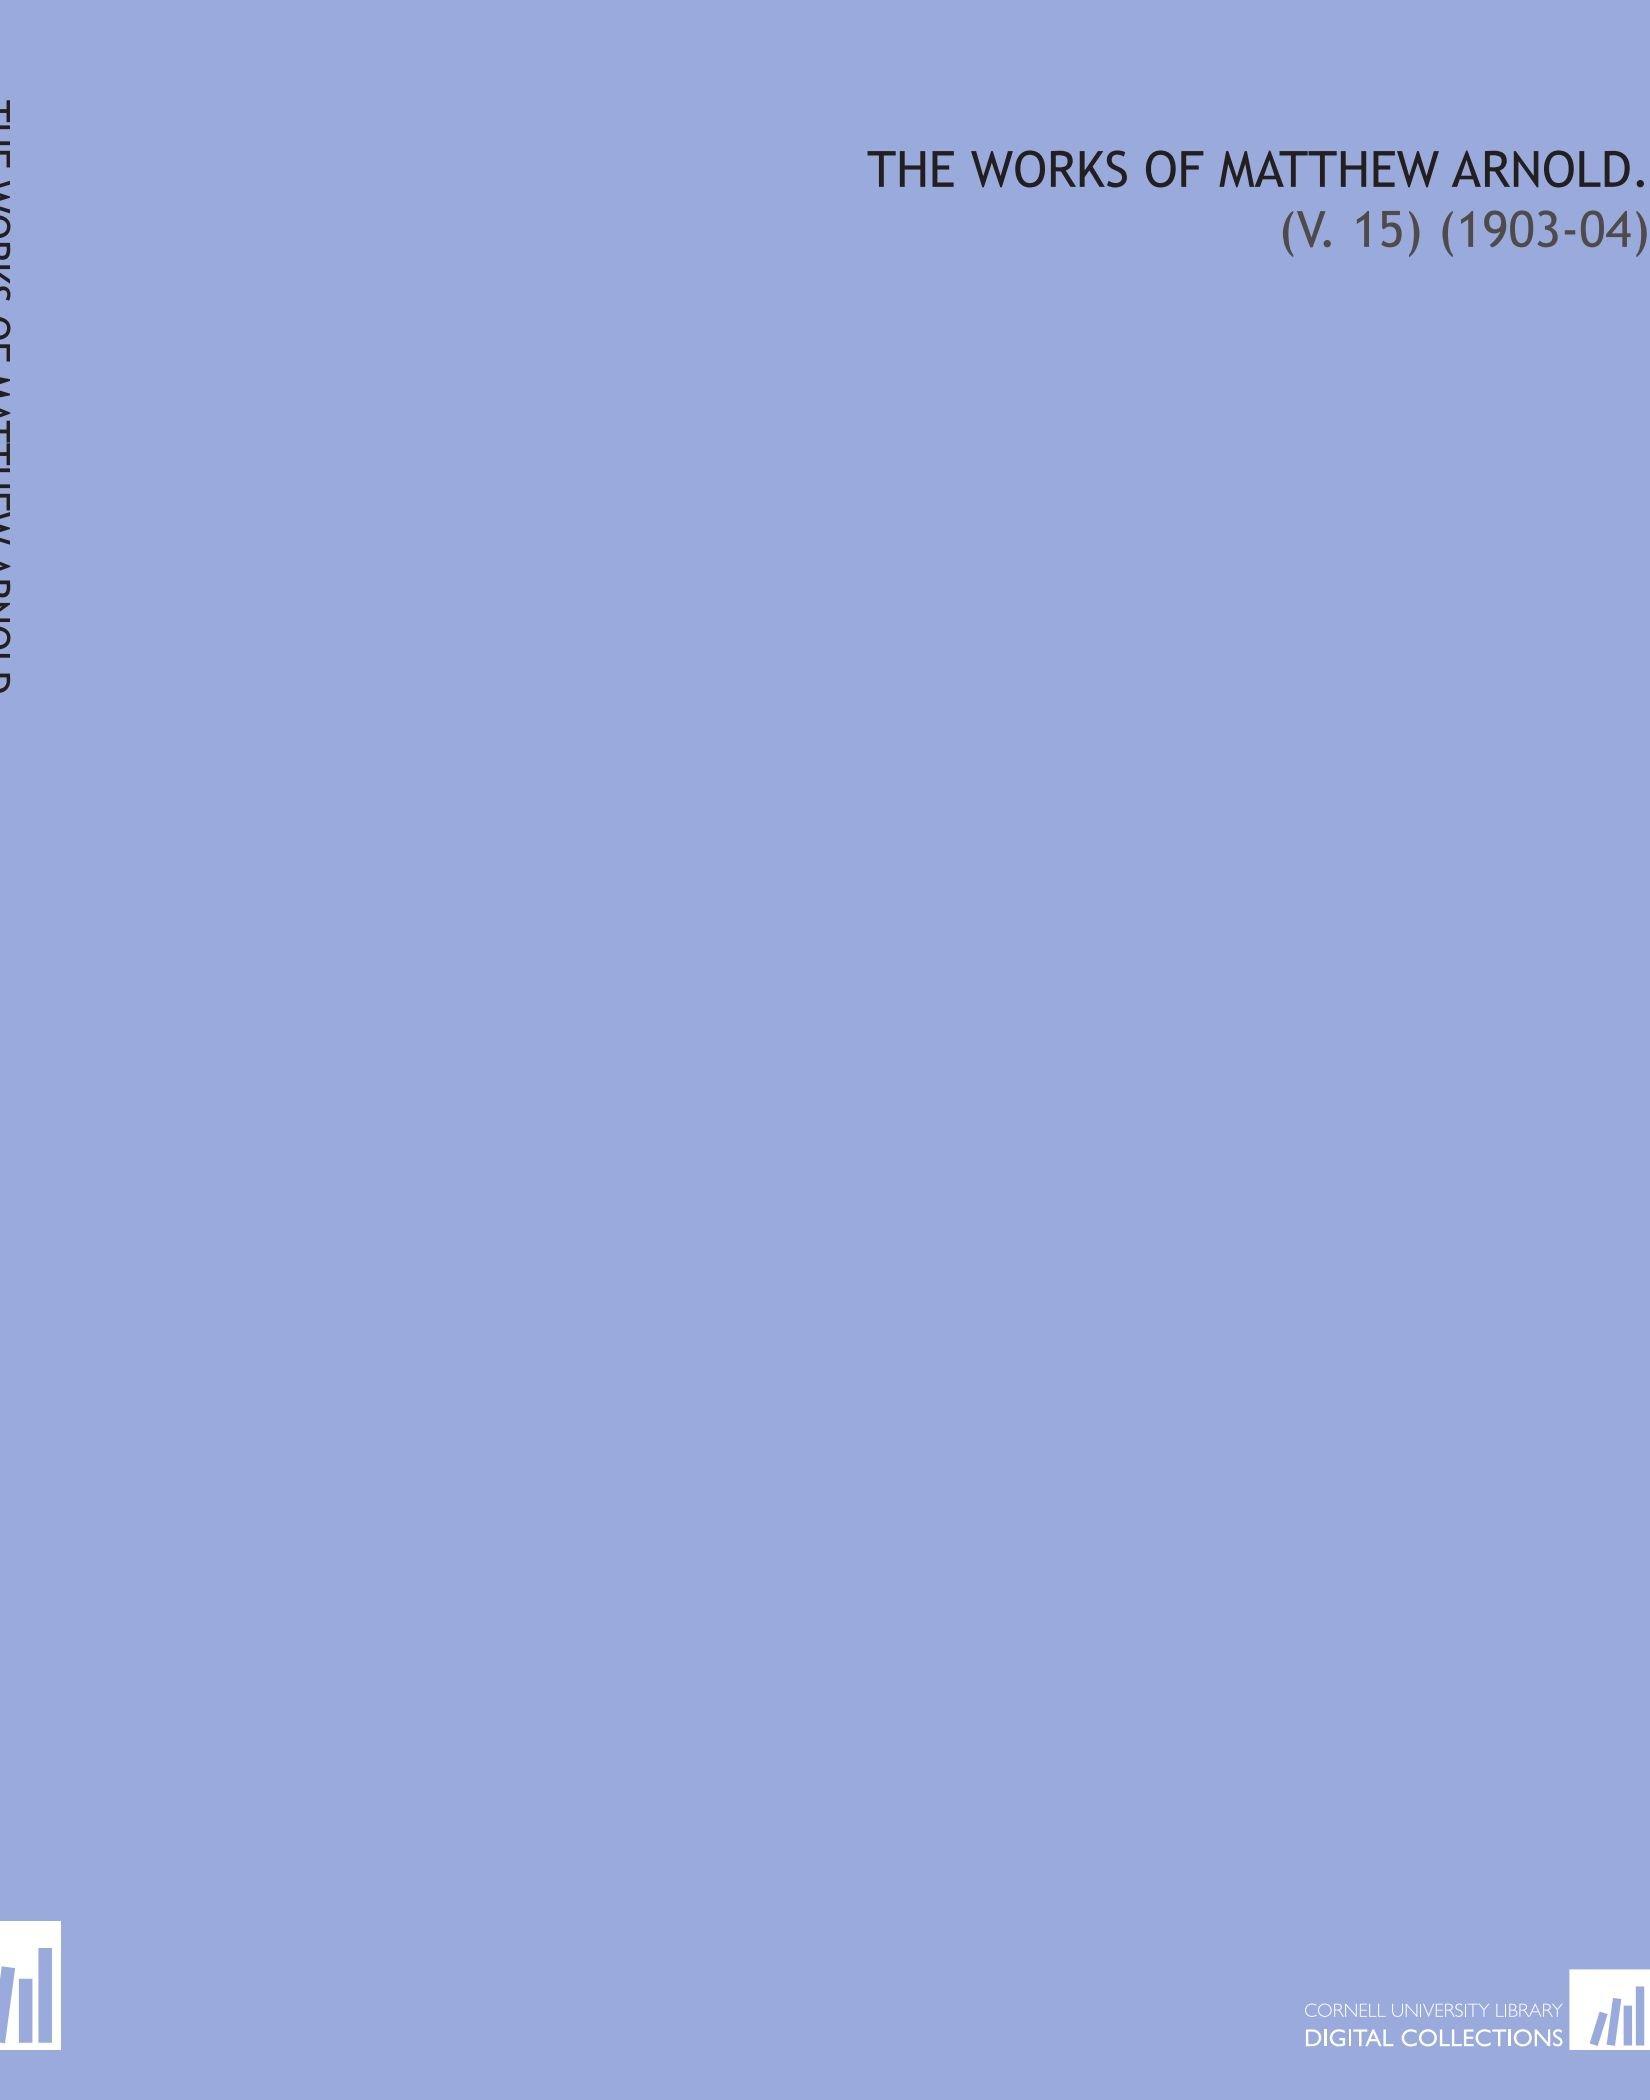 Download The Works of Matthew Arnold.: (V. 15) (1903-04) ebook